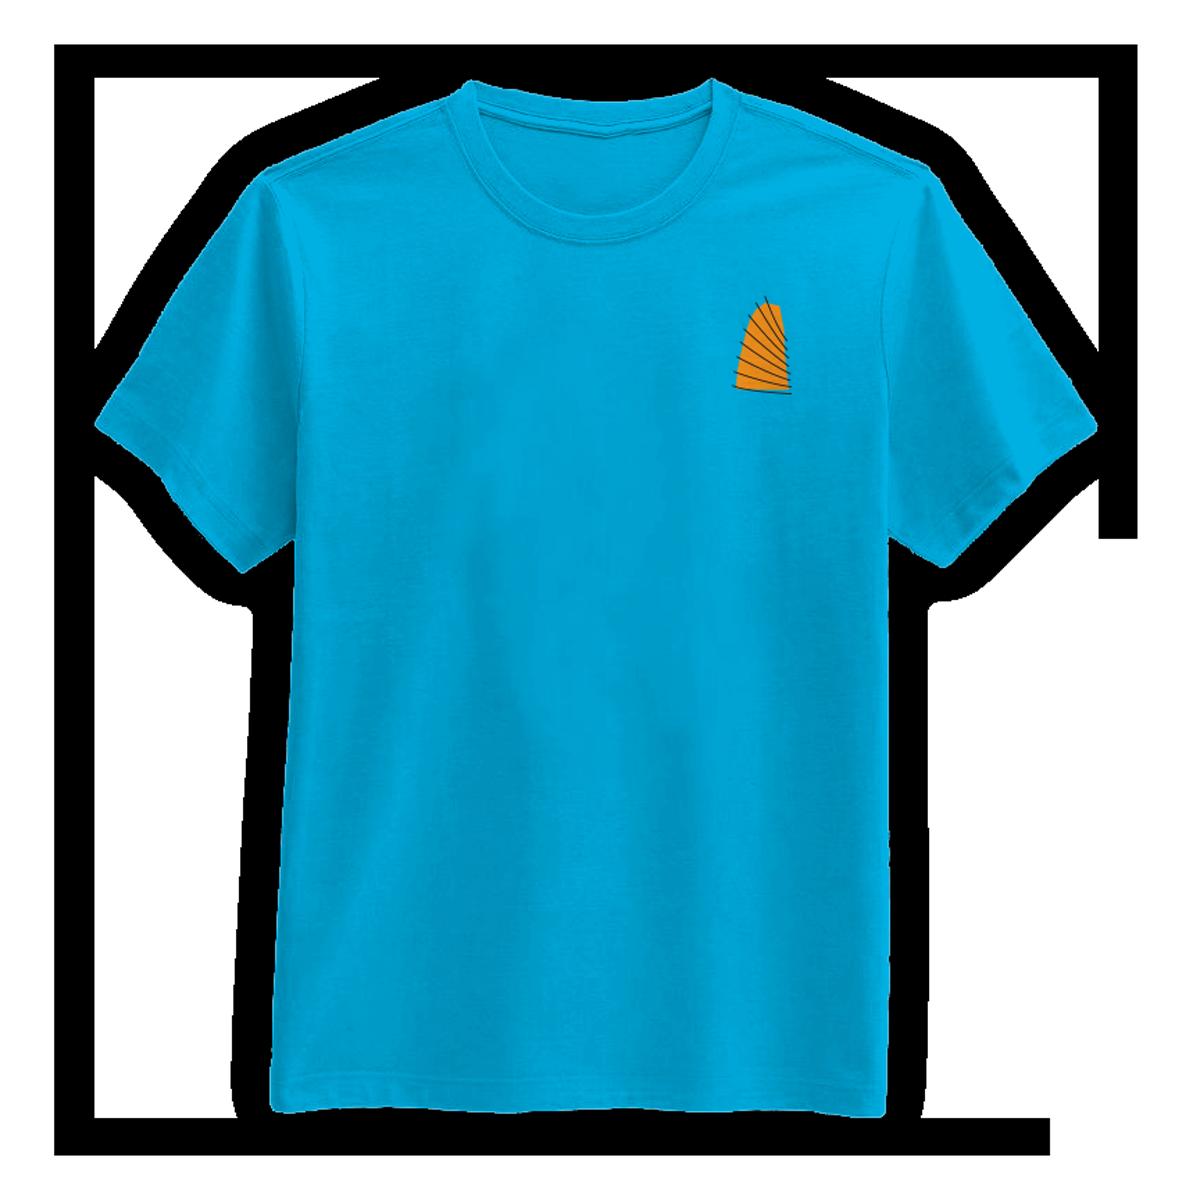 HaLongBay_Tshirt